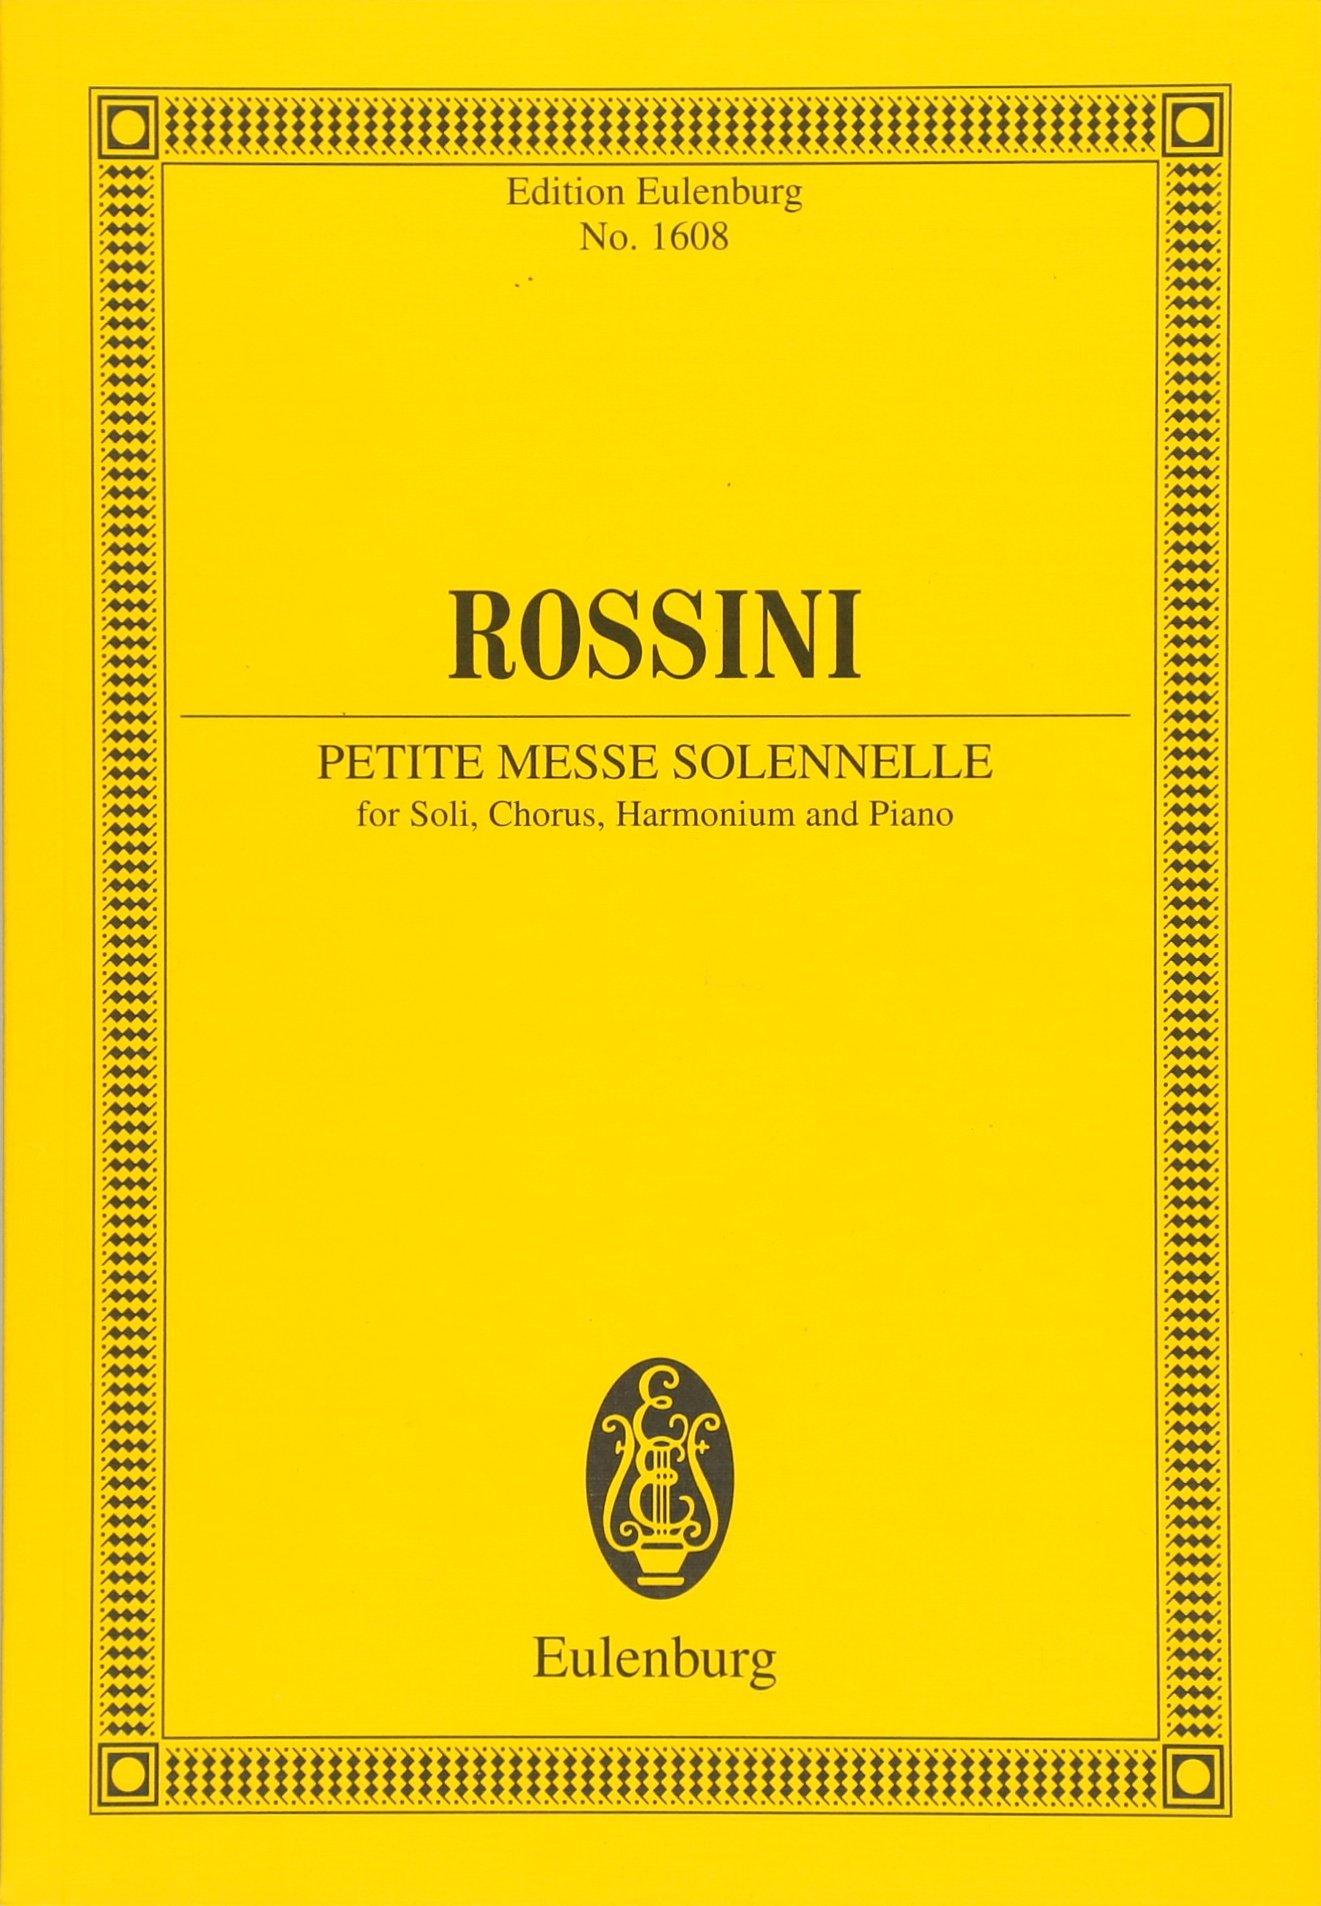 Petite Messe Solennelle: Soli, Chor, Harmonium und Klavier. Studienpartitur. (Eulenburg Studienpartituren) Gebundenes Buch – 19. Mai 2014 Gioacchino Rossini Mainz 3795772680 Musikalien